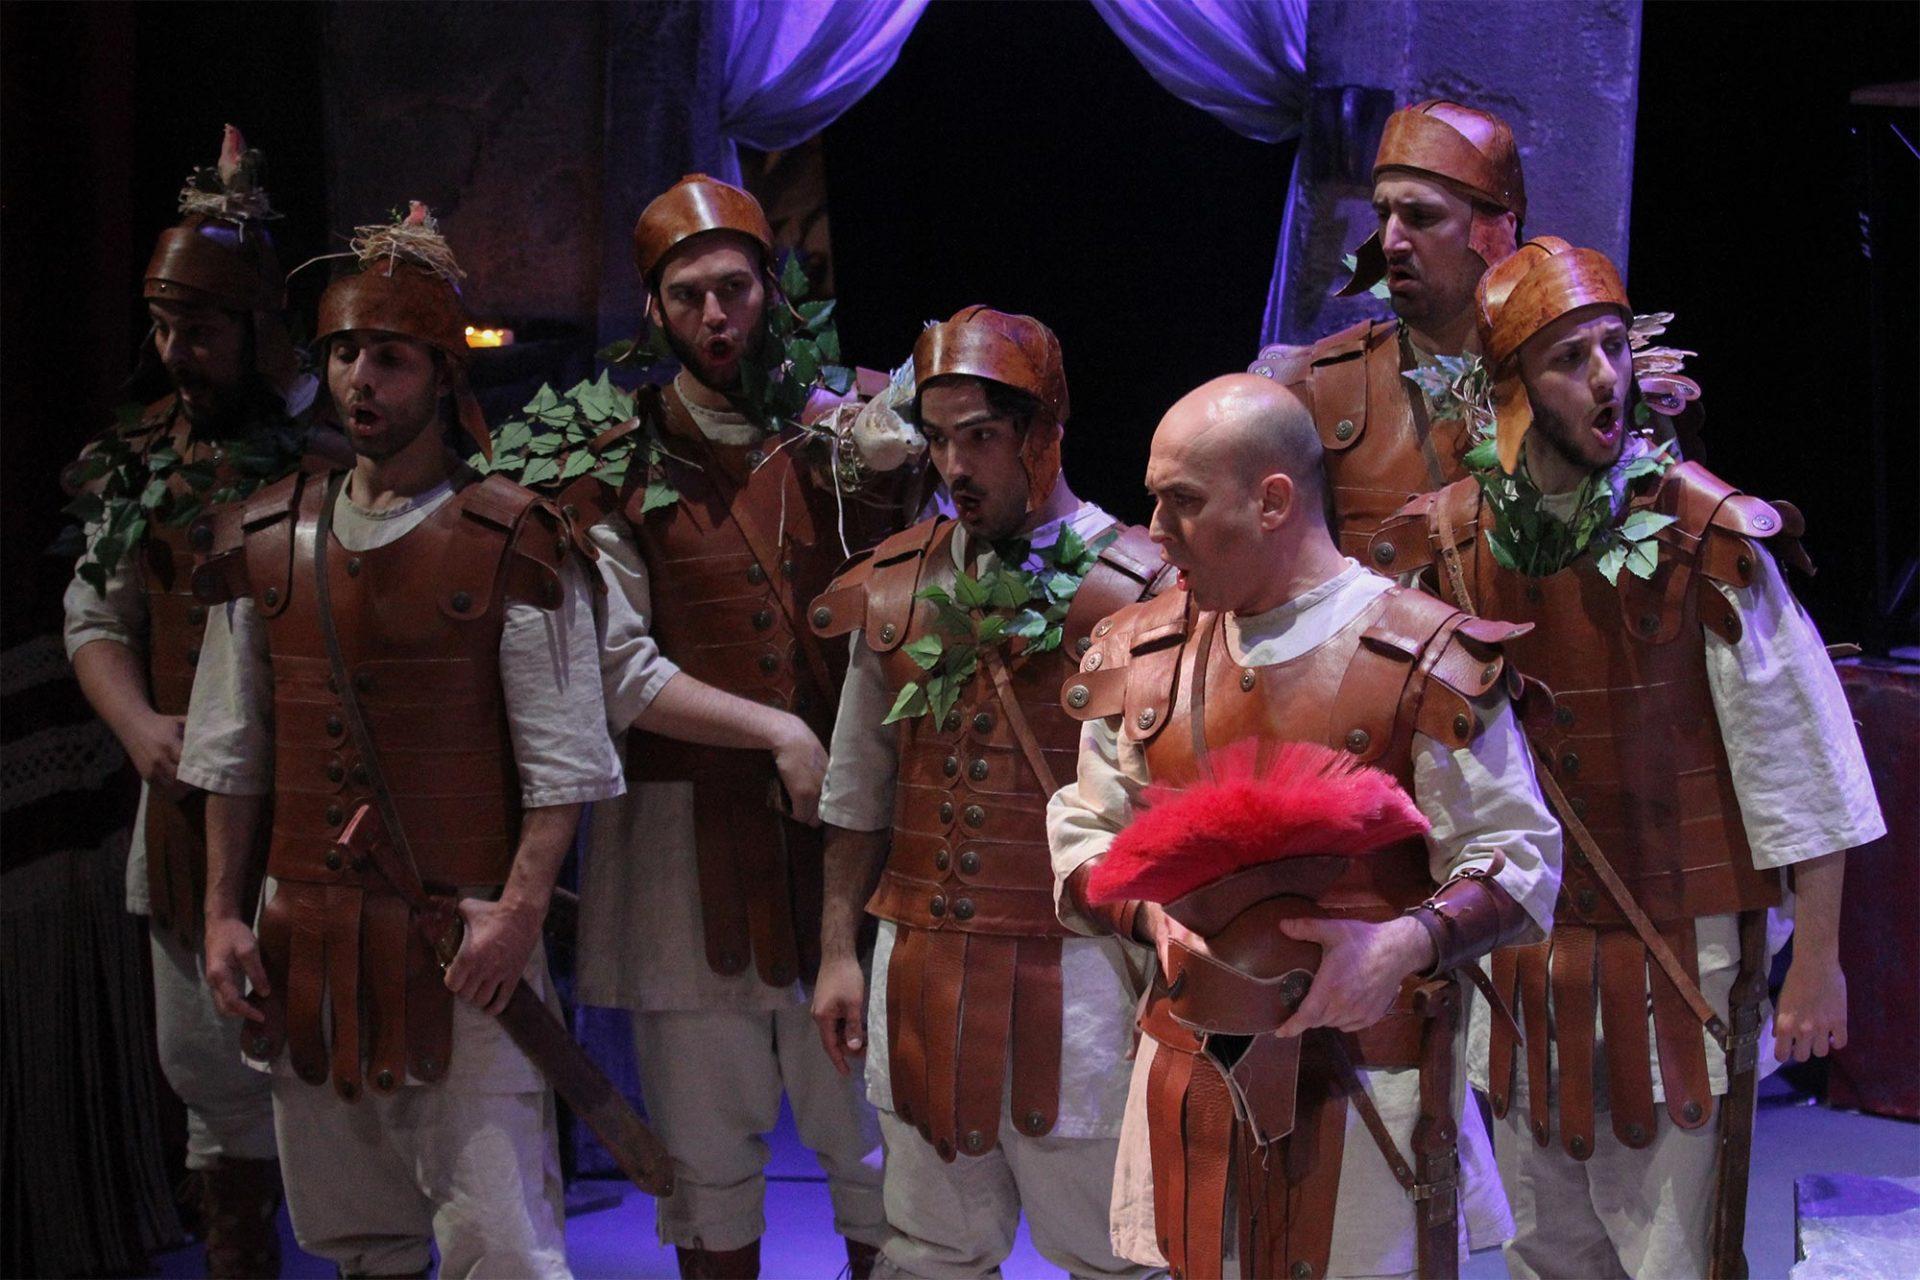 teatro-marrucino-giove-a-pompei-01